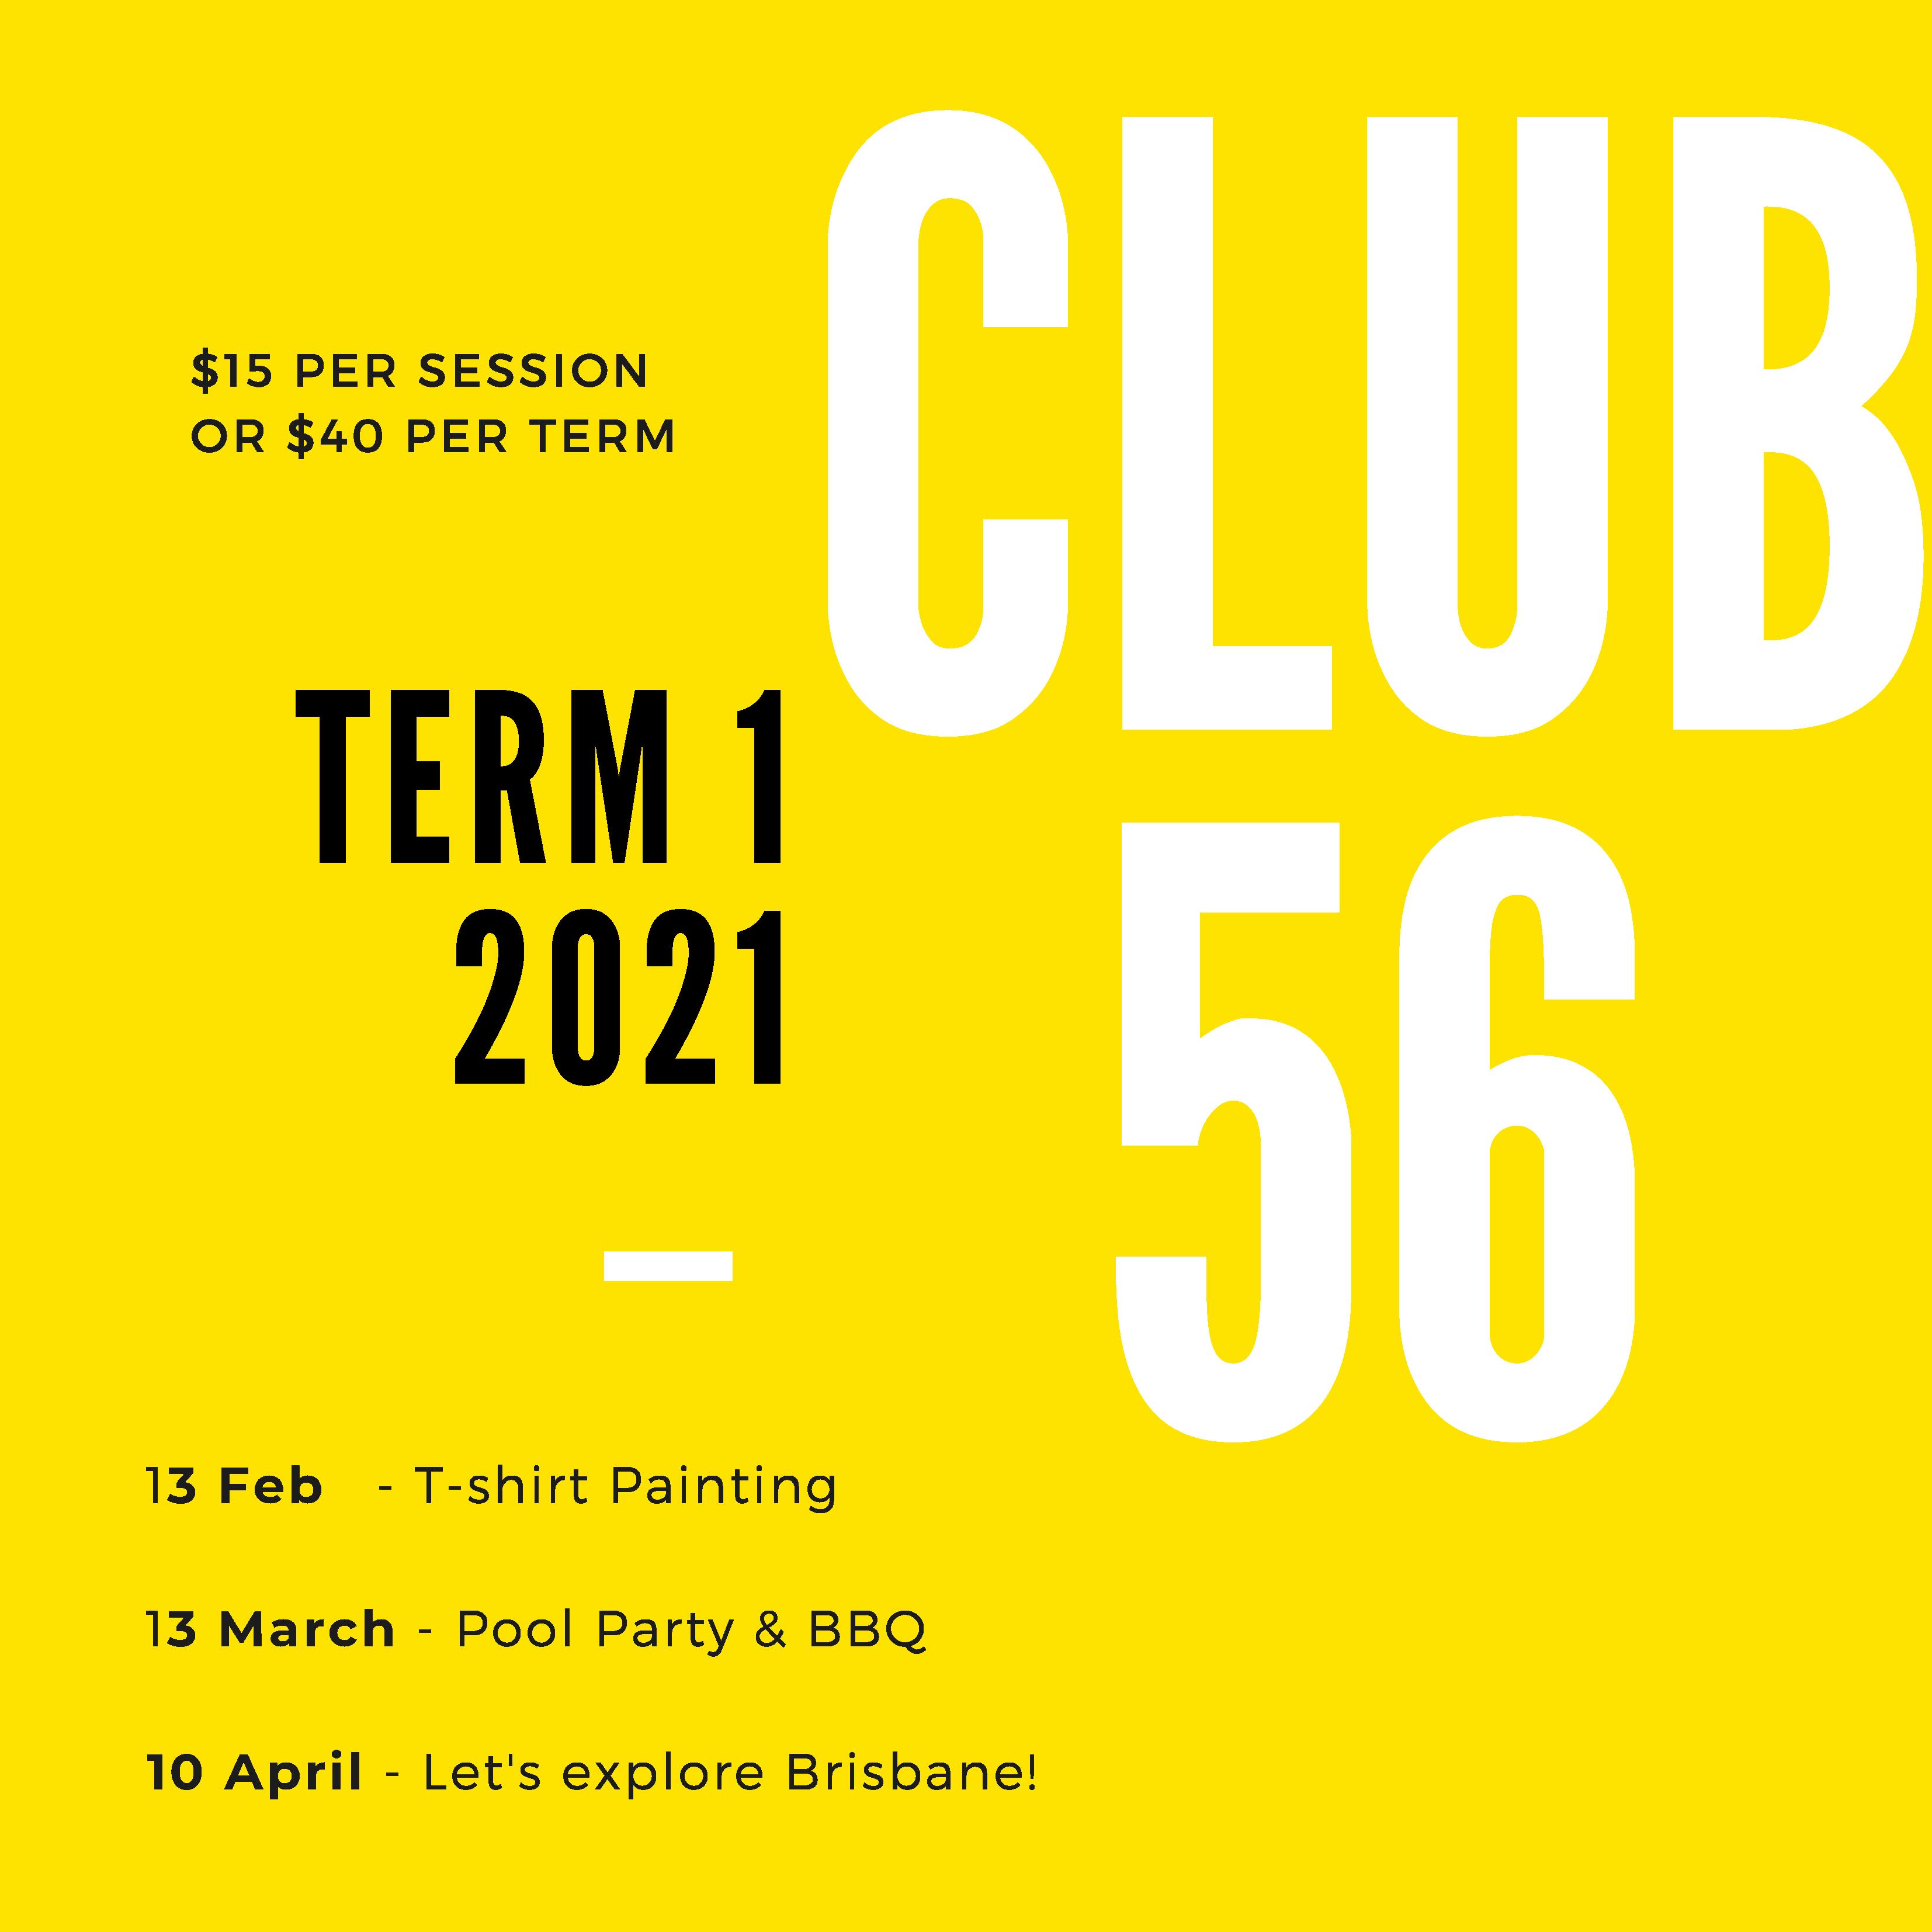 Club 56 - Term 1 2021